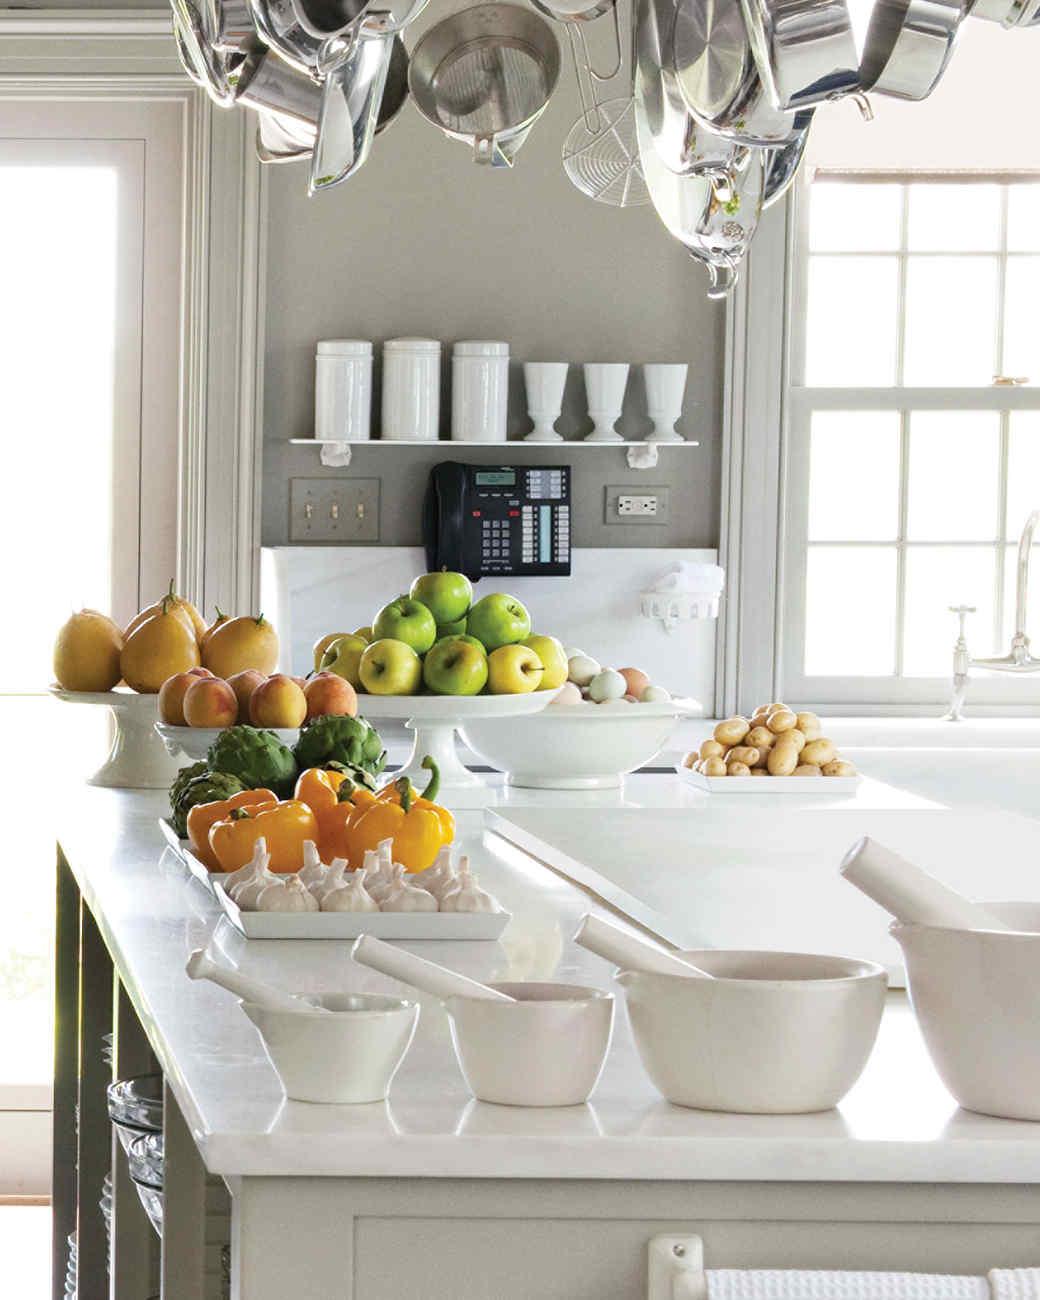 md106031_0910_kitchen_hanging_fruits.jpg